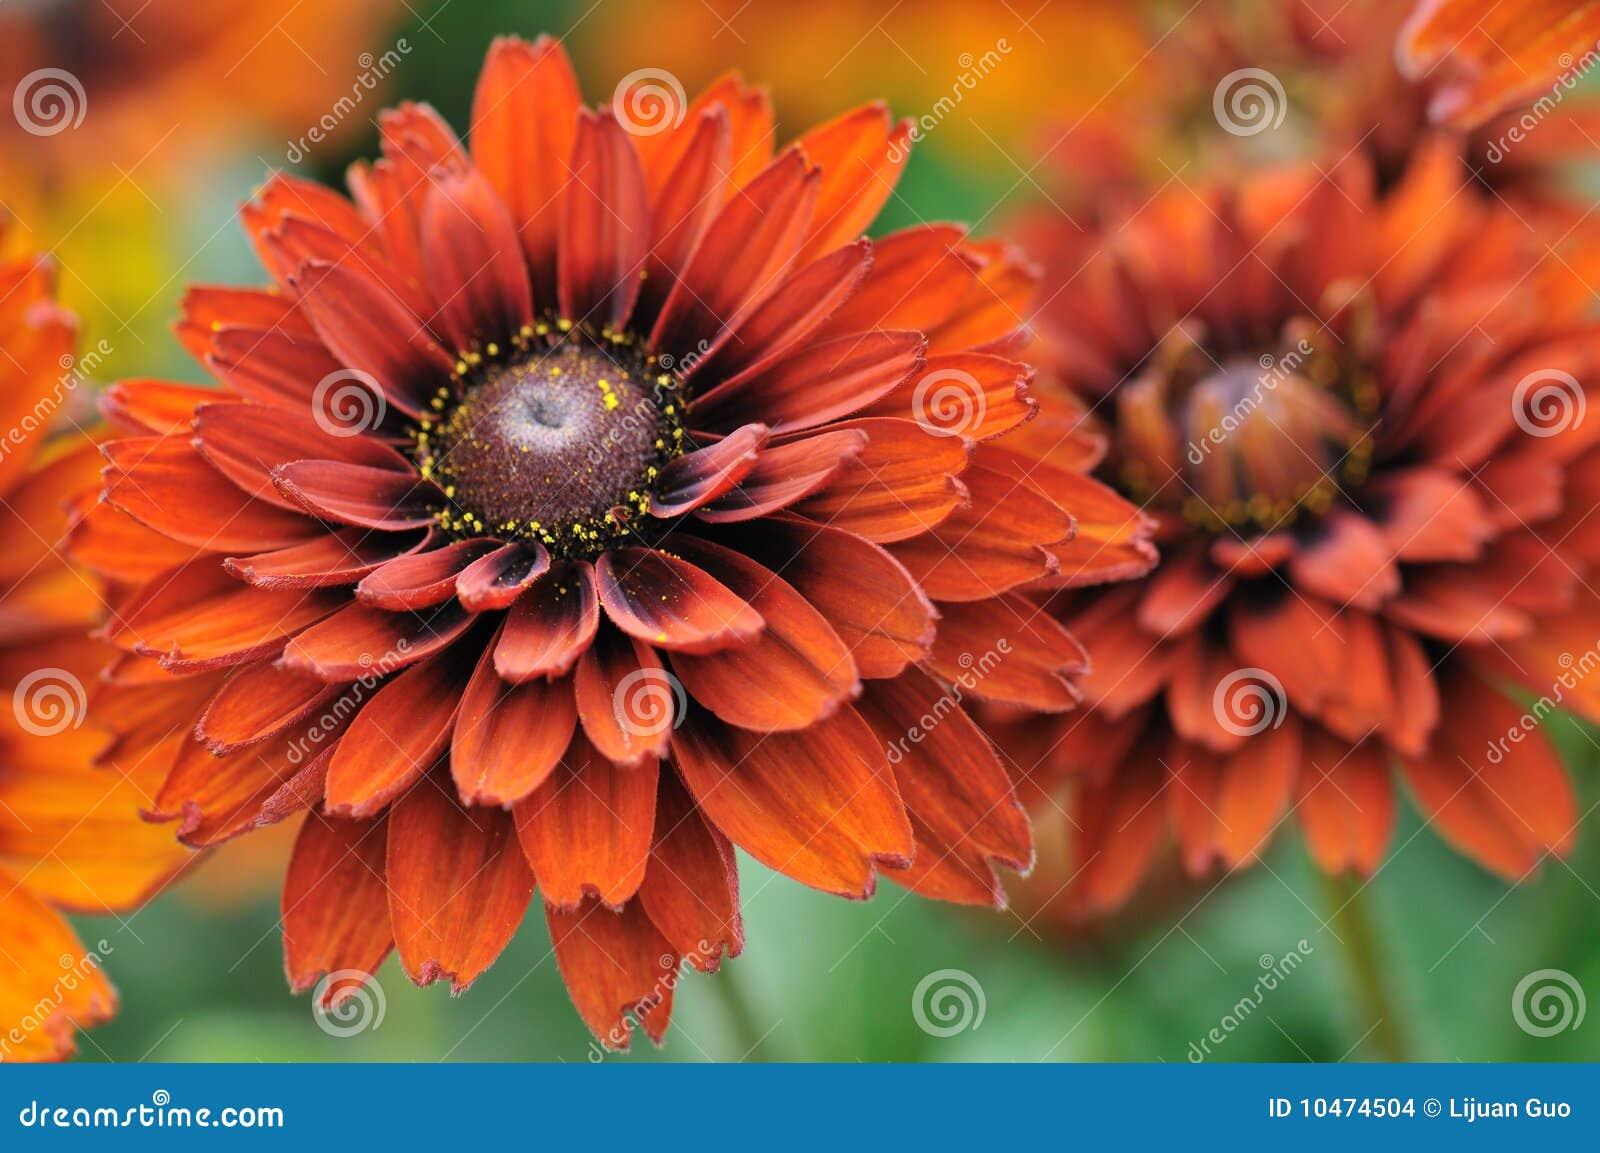 Fall Color Rudbeckia Flowers Stock Photo Image Of Dark Yellow 10474504